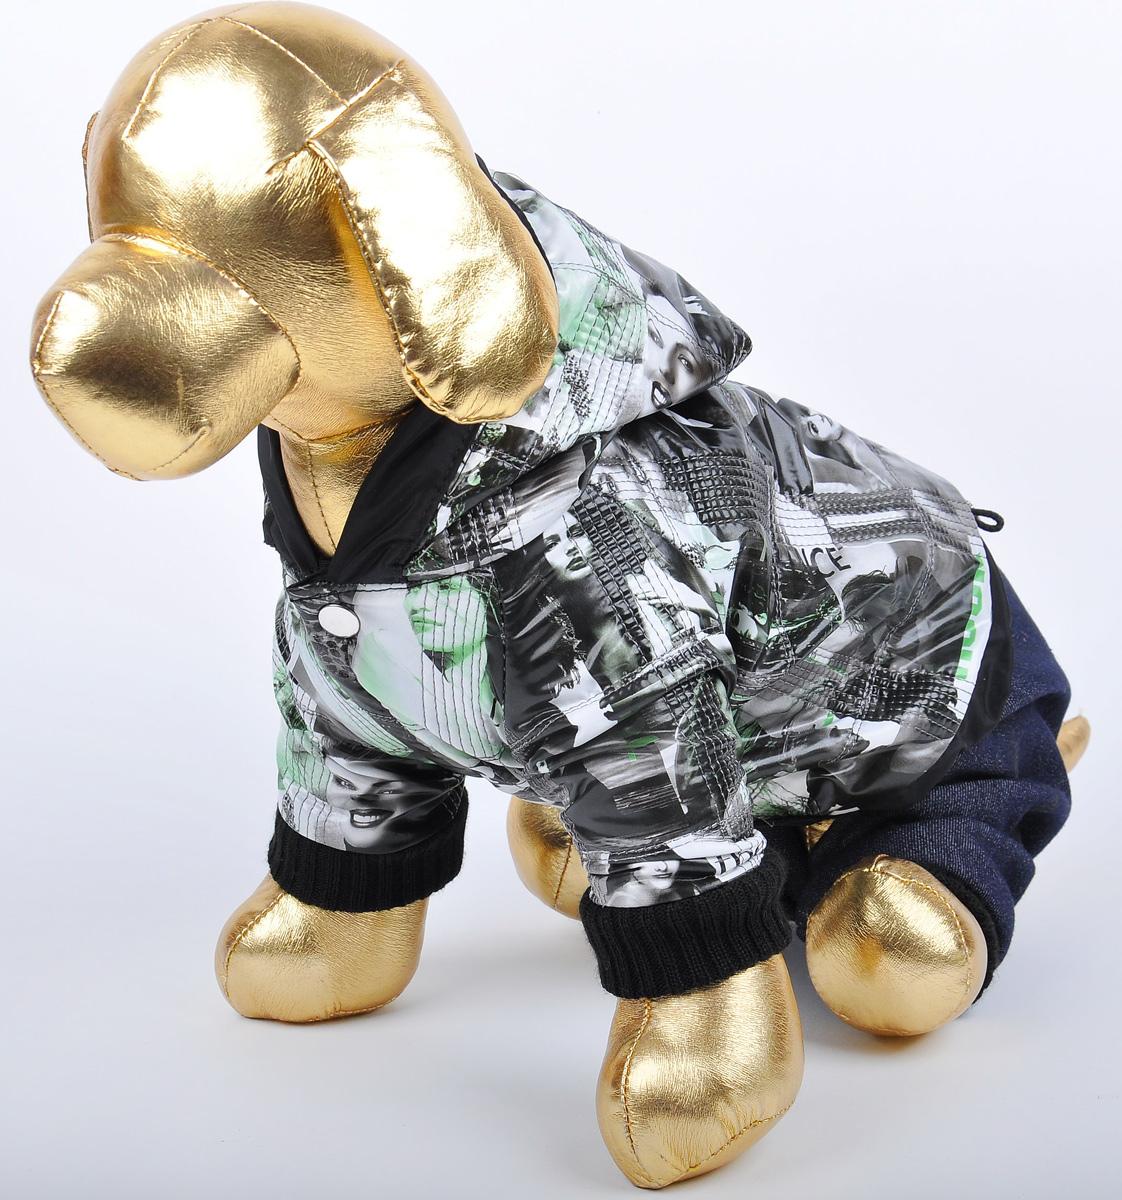 Куртка со штанами для собак GLG Столица. Размер XSMOS-017-XSКуртка с джинсовыми штанами для собак столица, материал куртка болонья, штаны джинса х/б, размер-XS, длина спины19-21см, объем груди-26-28см.